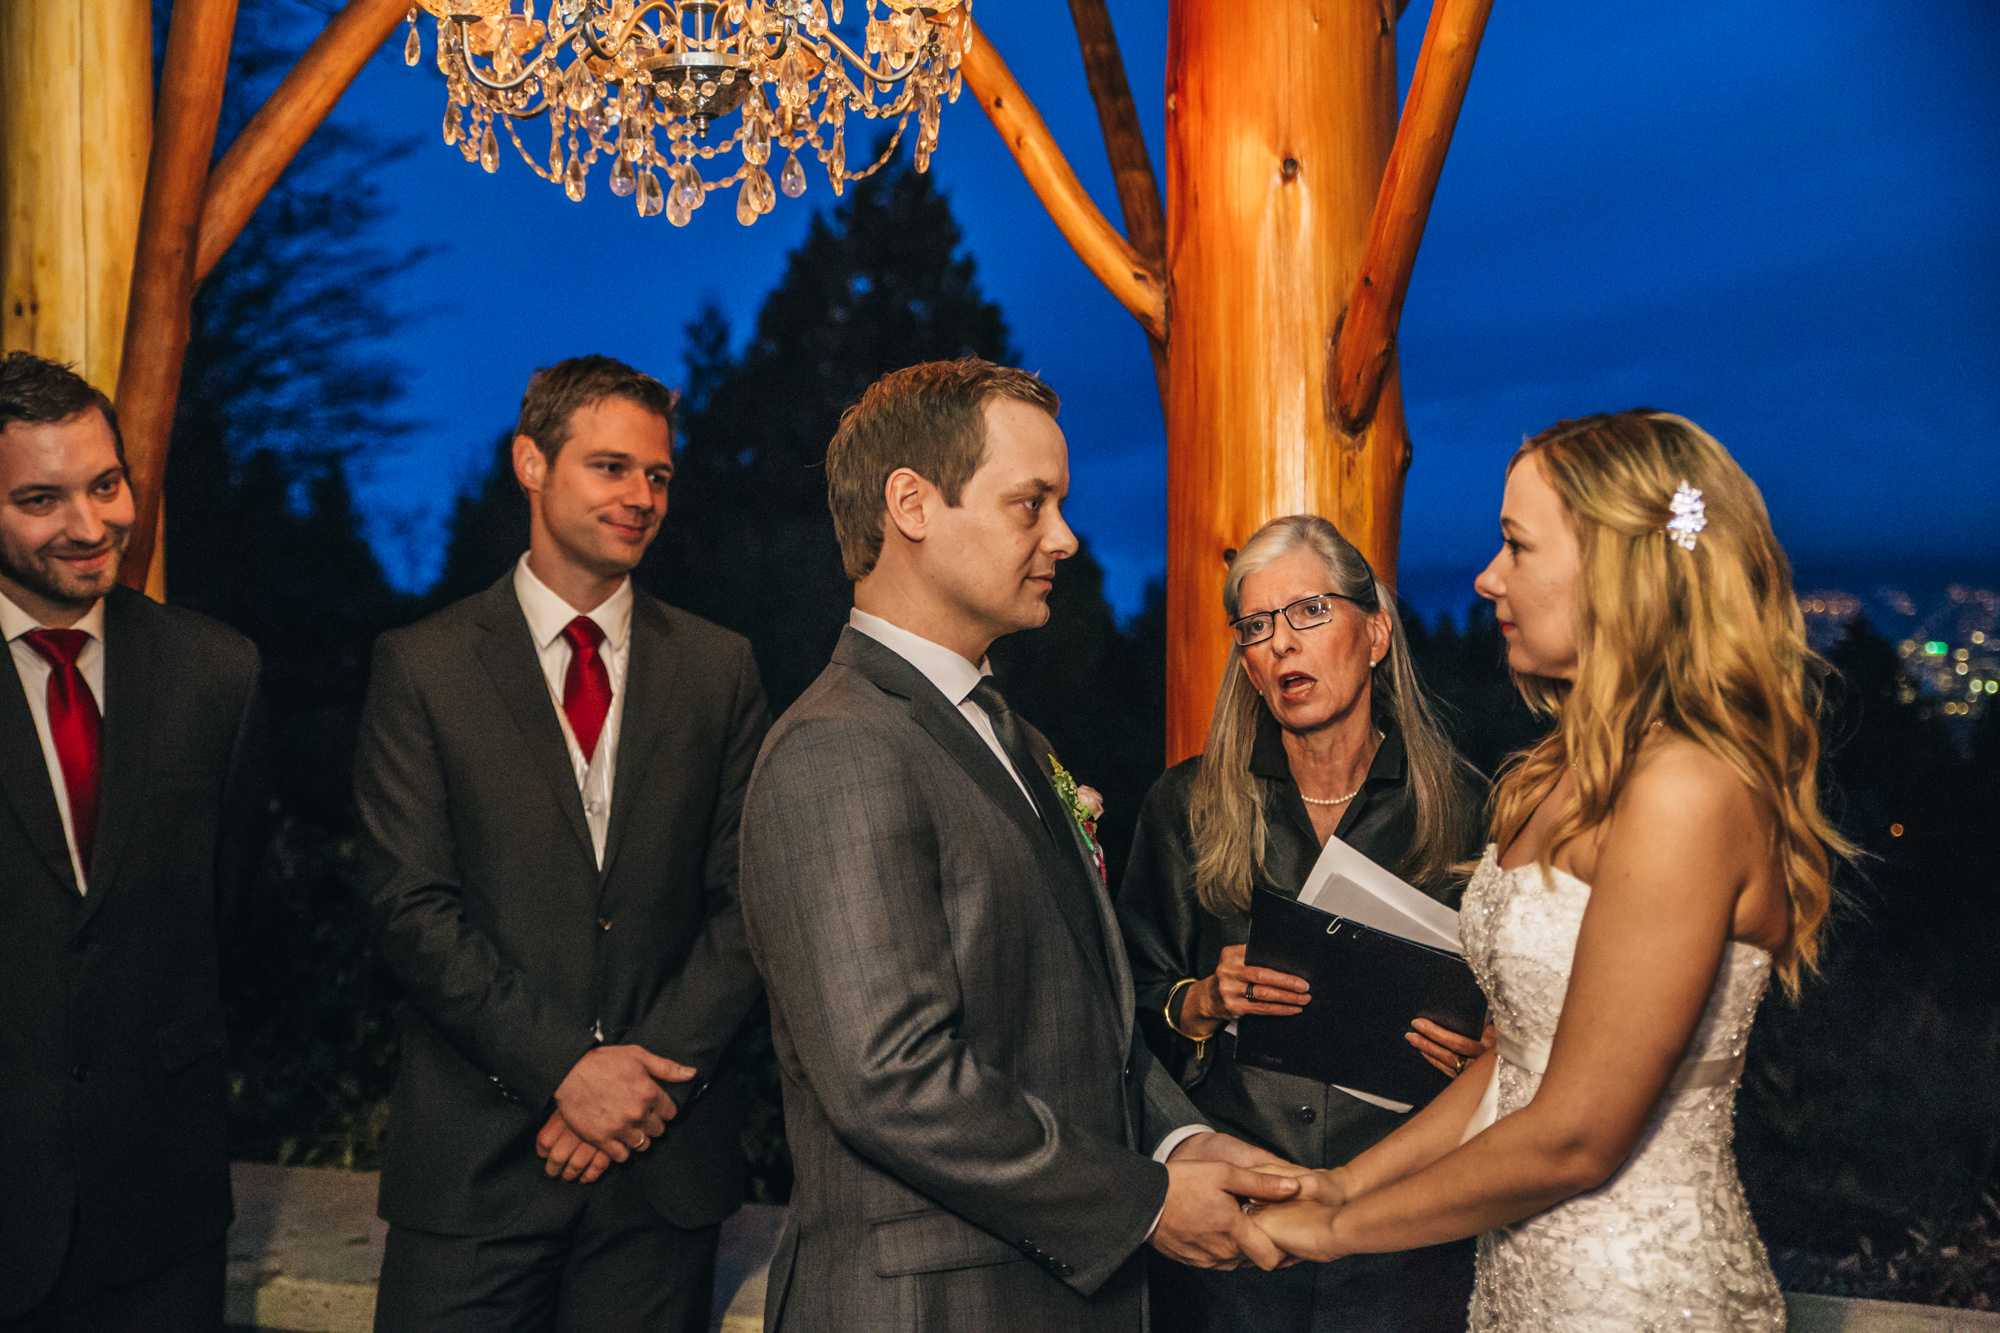 24-seasons-in-the-park-wedding-ceremony.jpg